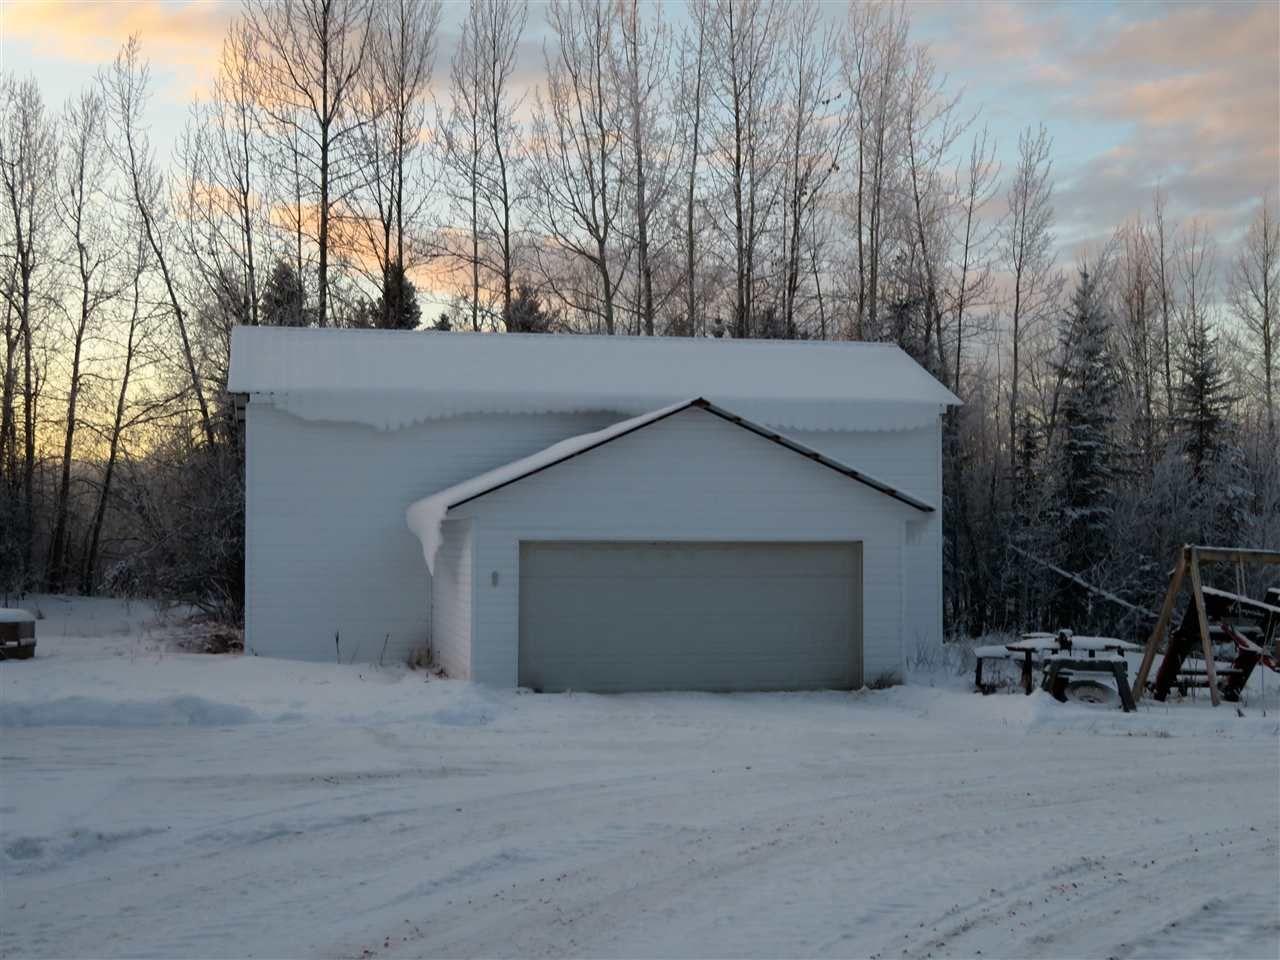 Photo 34: Photos: MILE 283 97 (ALASKA) Highway in Fort Nelson: Fort Nelson - Rural House for sale (Fort Nelson (Zone 64))  : MLS®# R2275782